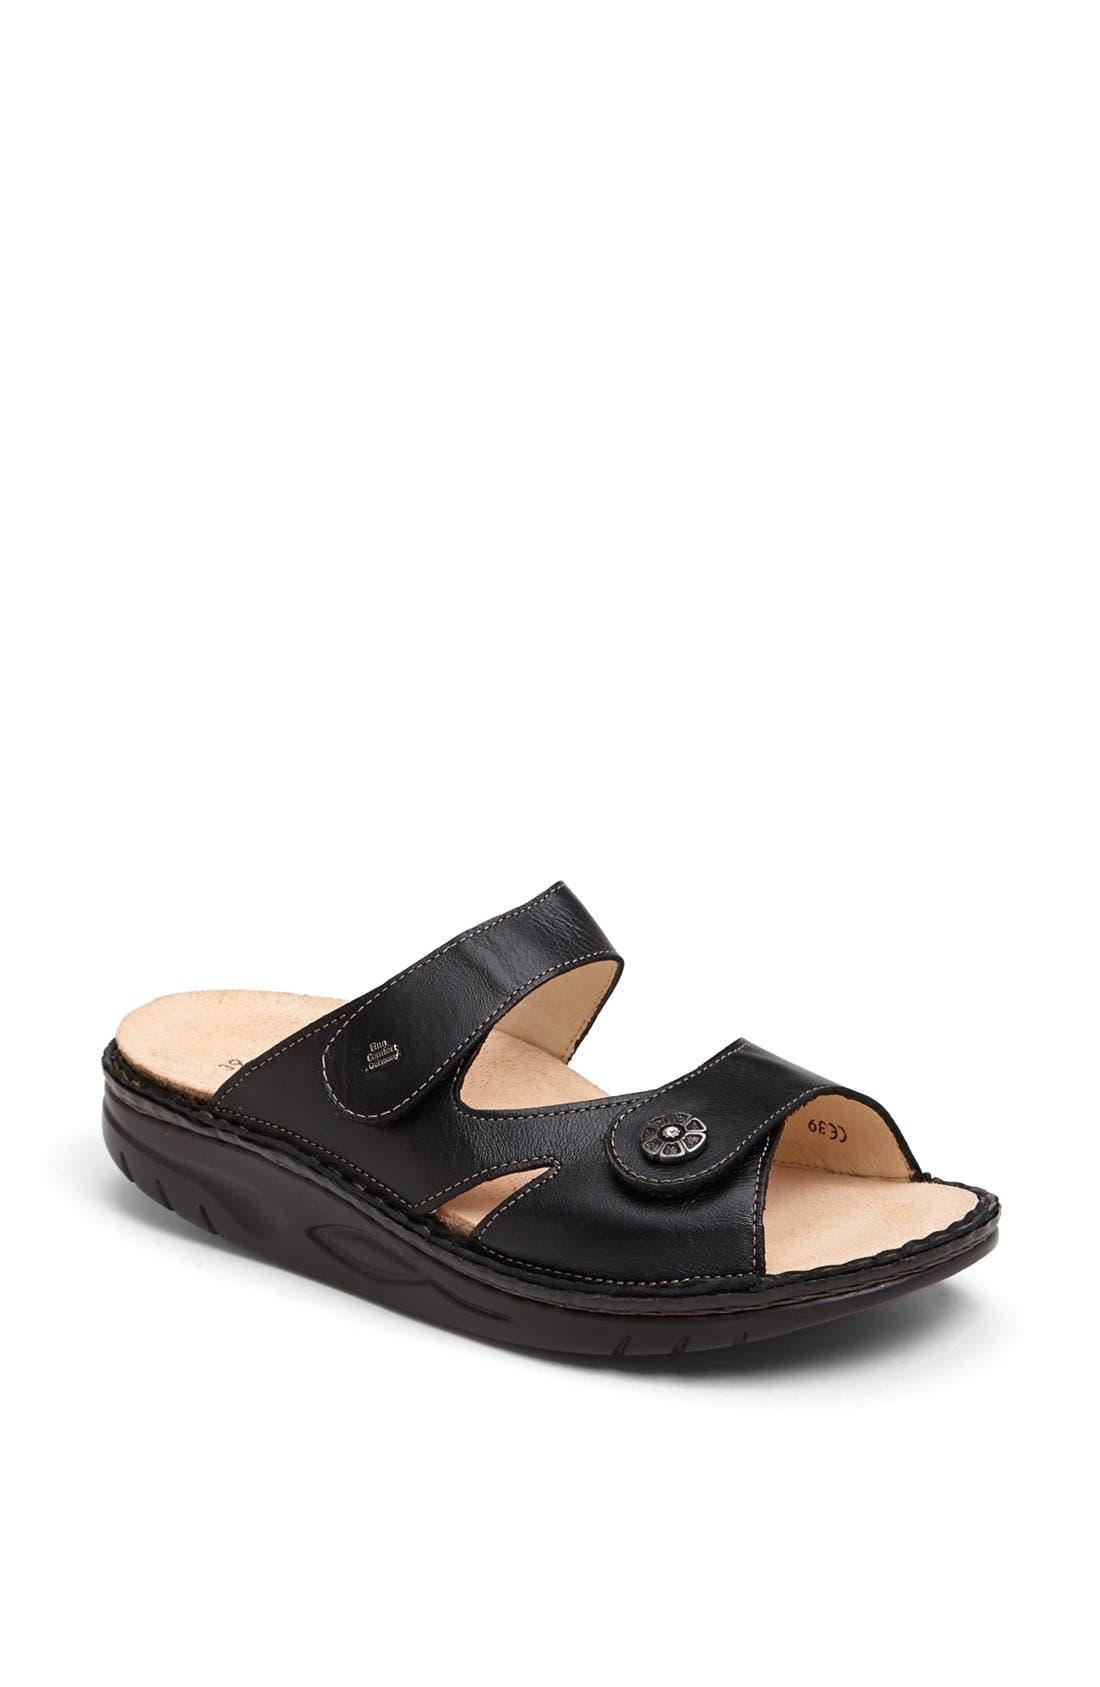 FINNAMIC by Finn Comfort 'Sanaa' Walking Sandal,                             Main thumbnail 1, color,                             Black